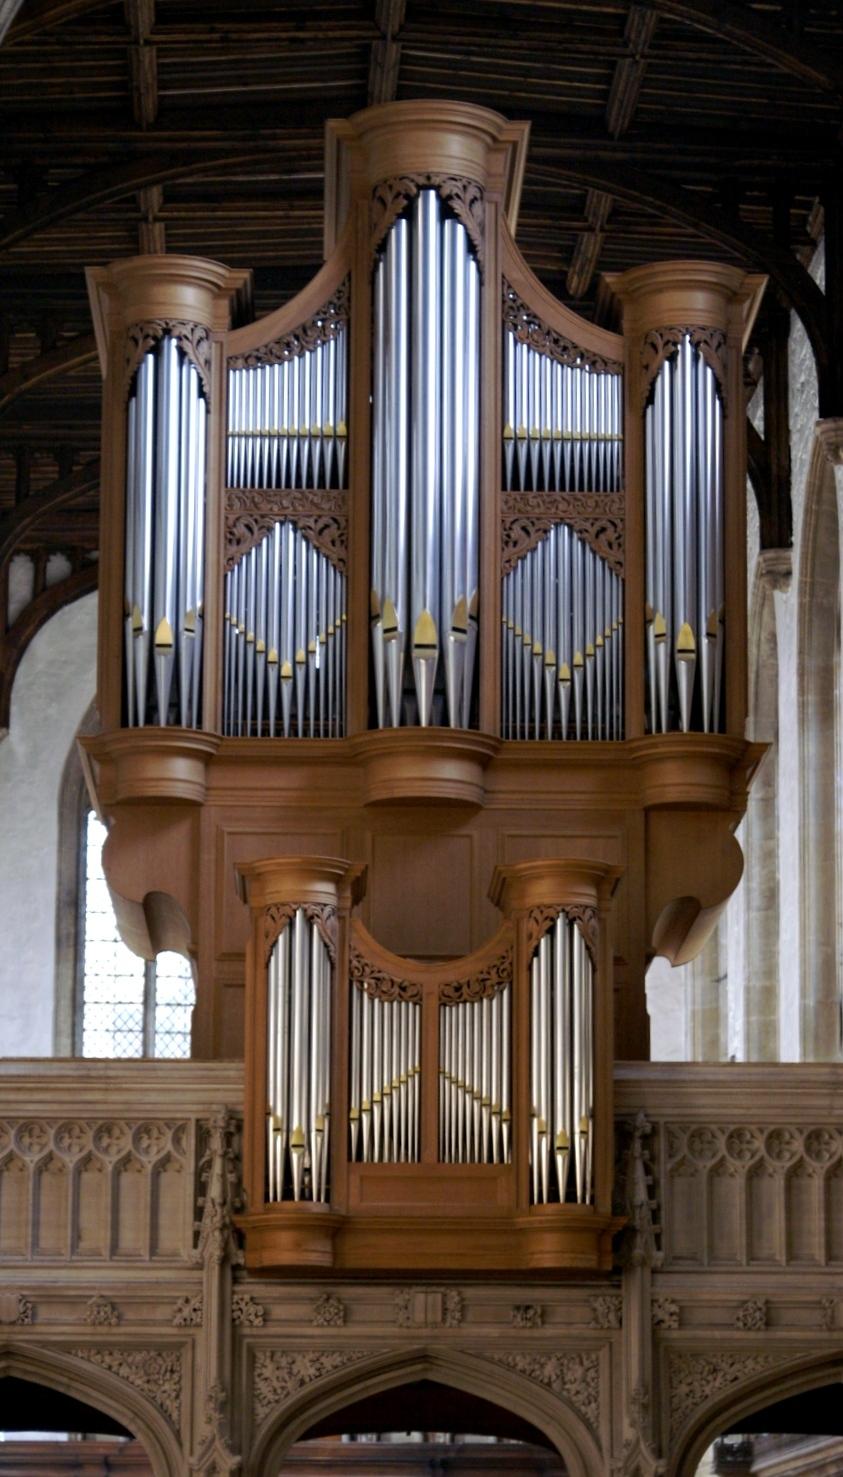 Metzler organ, The University Church of St Mary the Virgin (Photo: R Blanch)